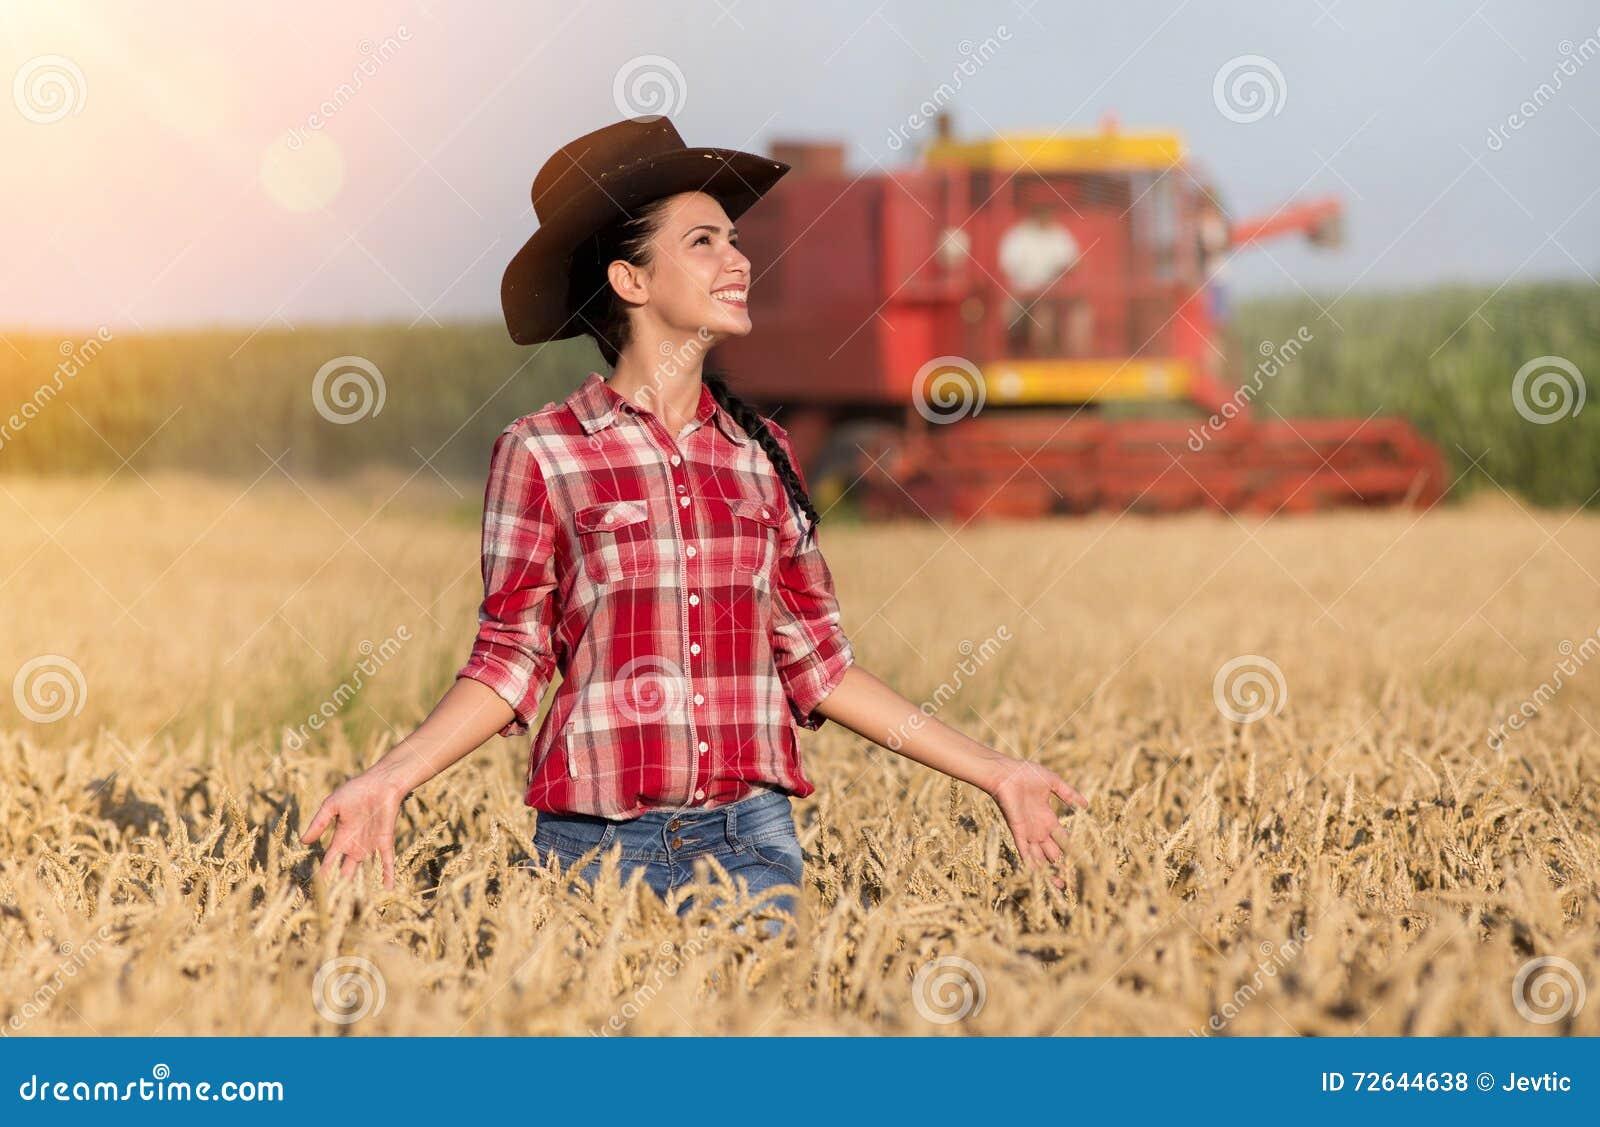 Happy Farmer Girl In Wheat Field Royalty-Free Stock Image ...